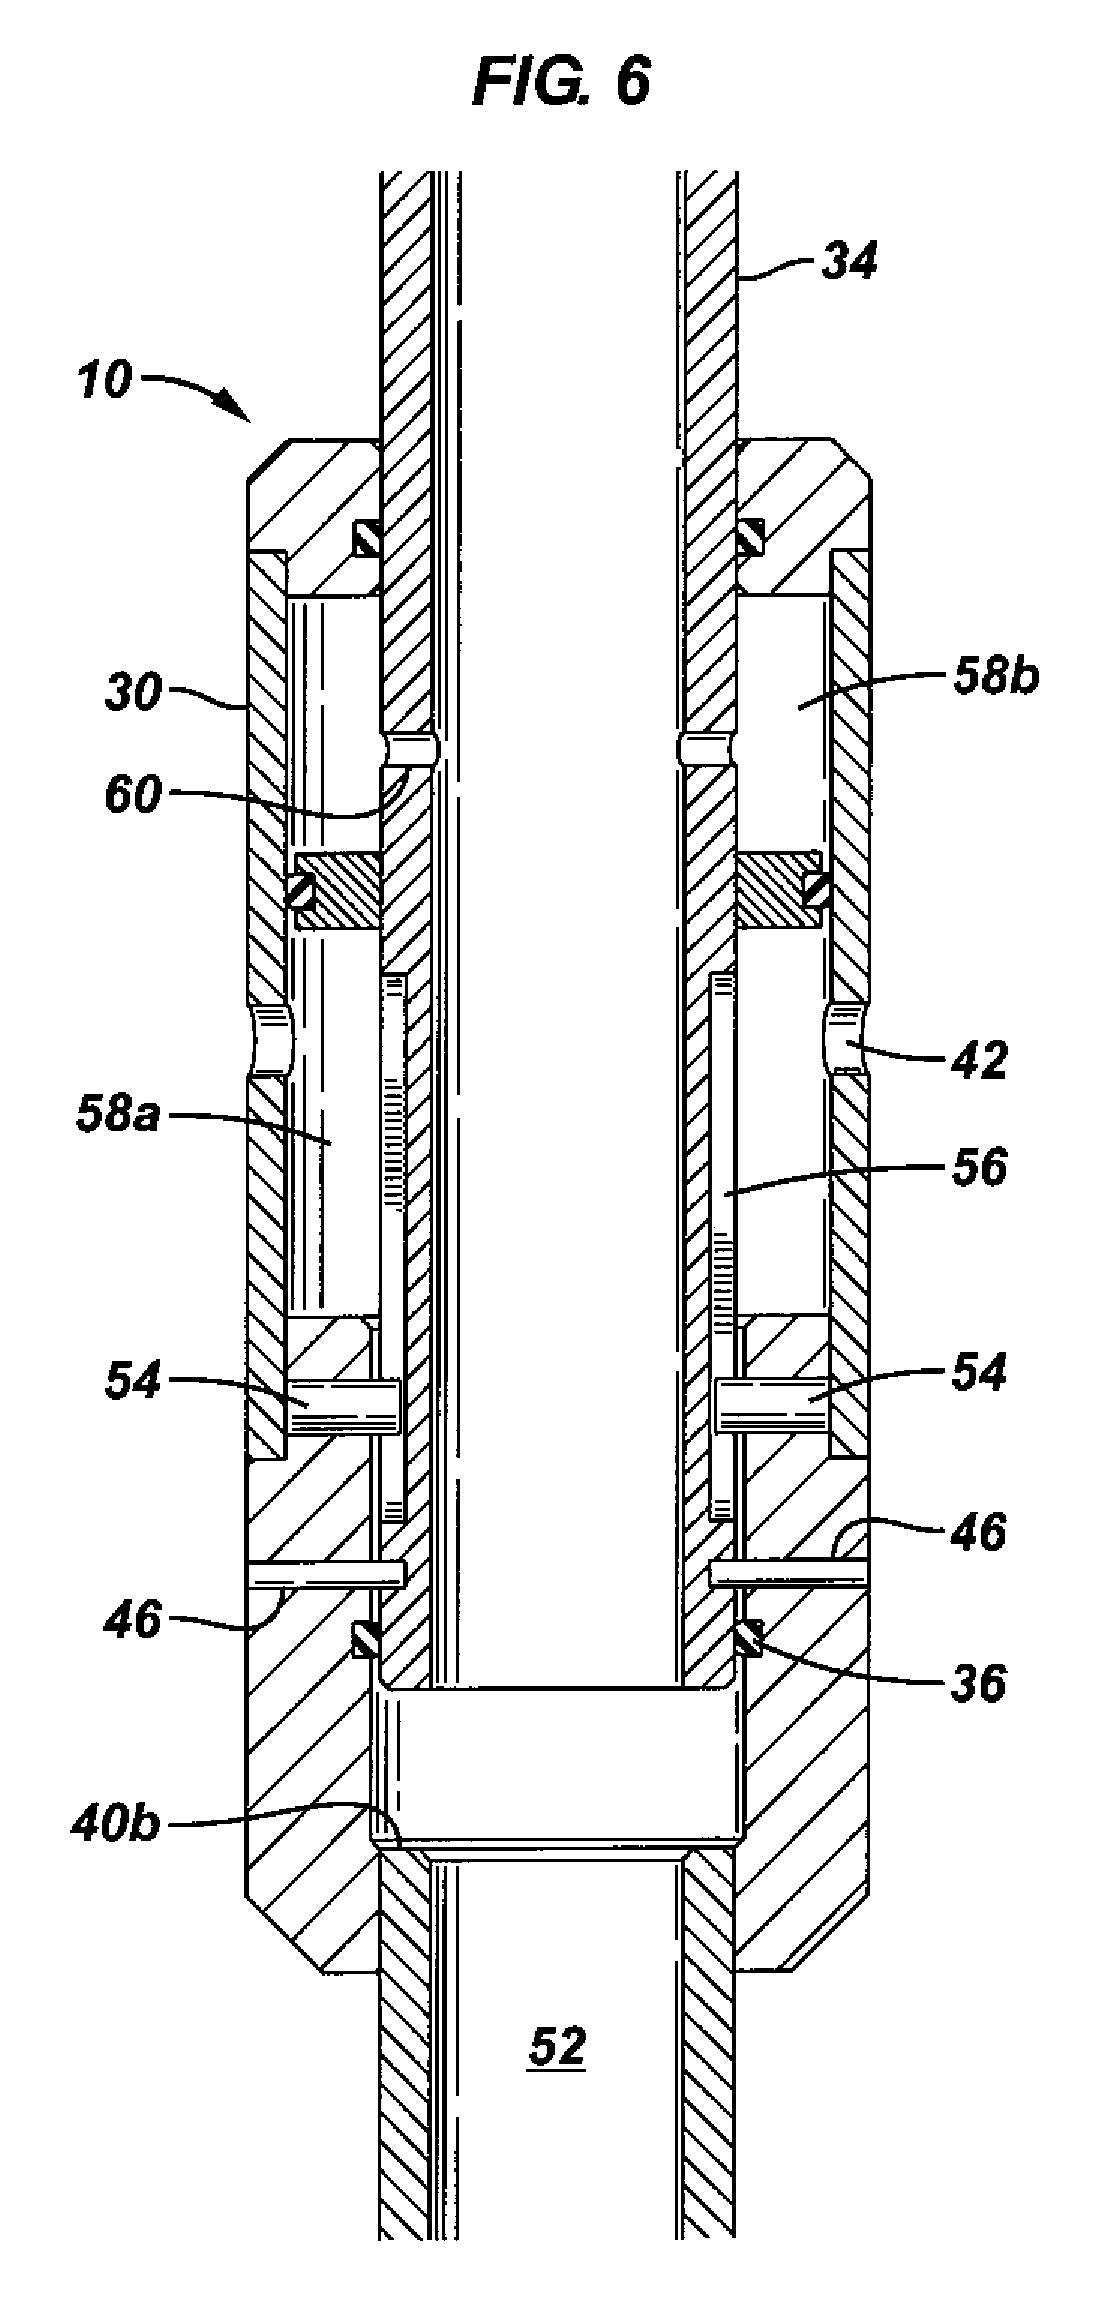 L5 20 Wiring Diagram. L5-30r Wiring Diagram, L6-15p Wiring Diagram Nema L P Wiring Diagram on